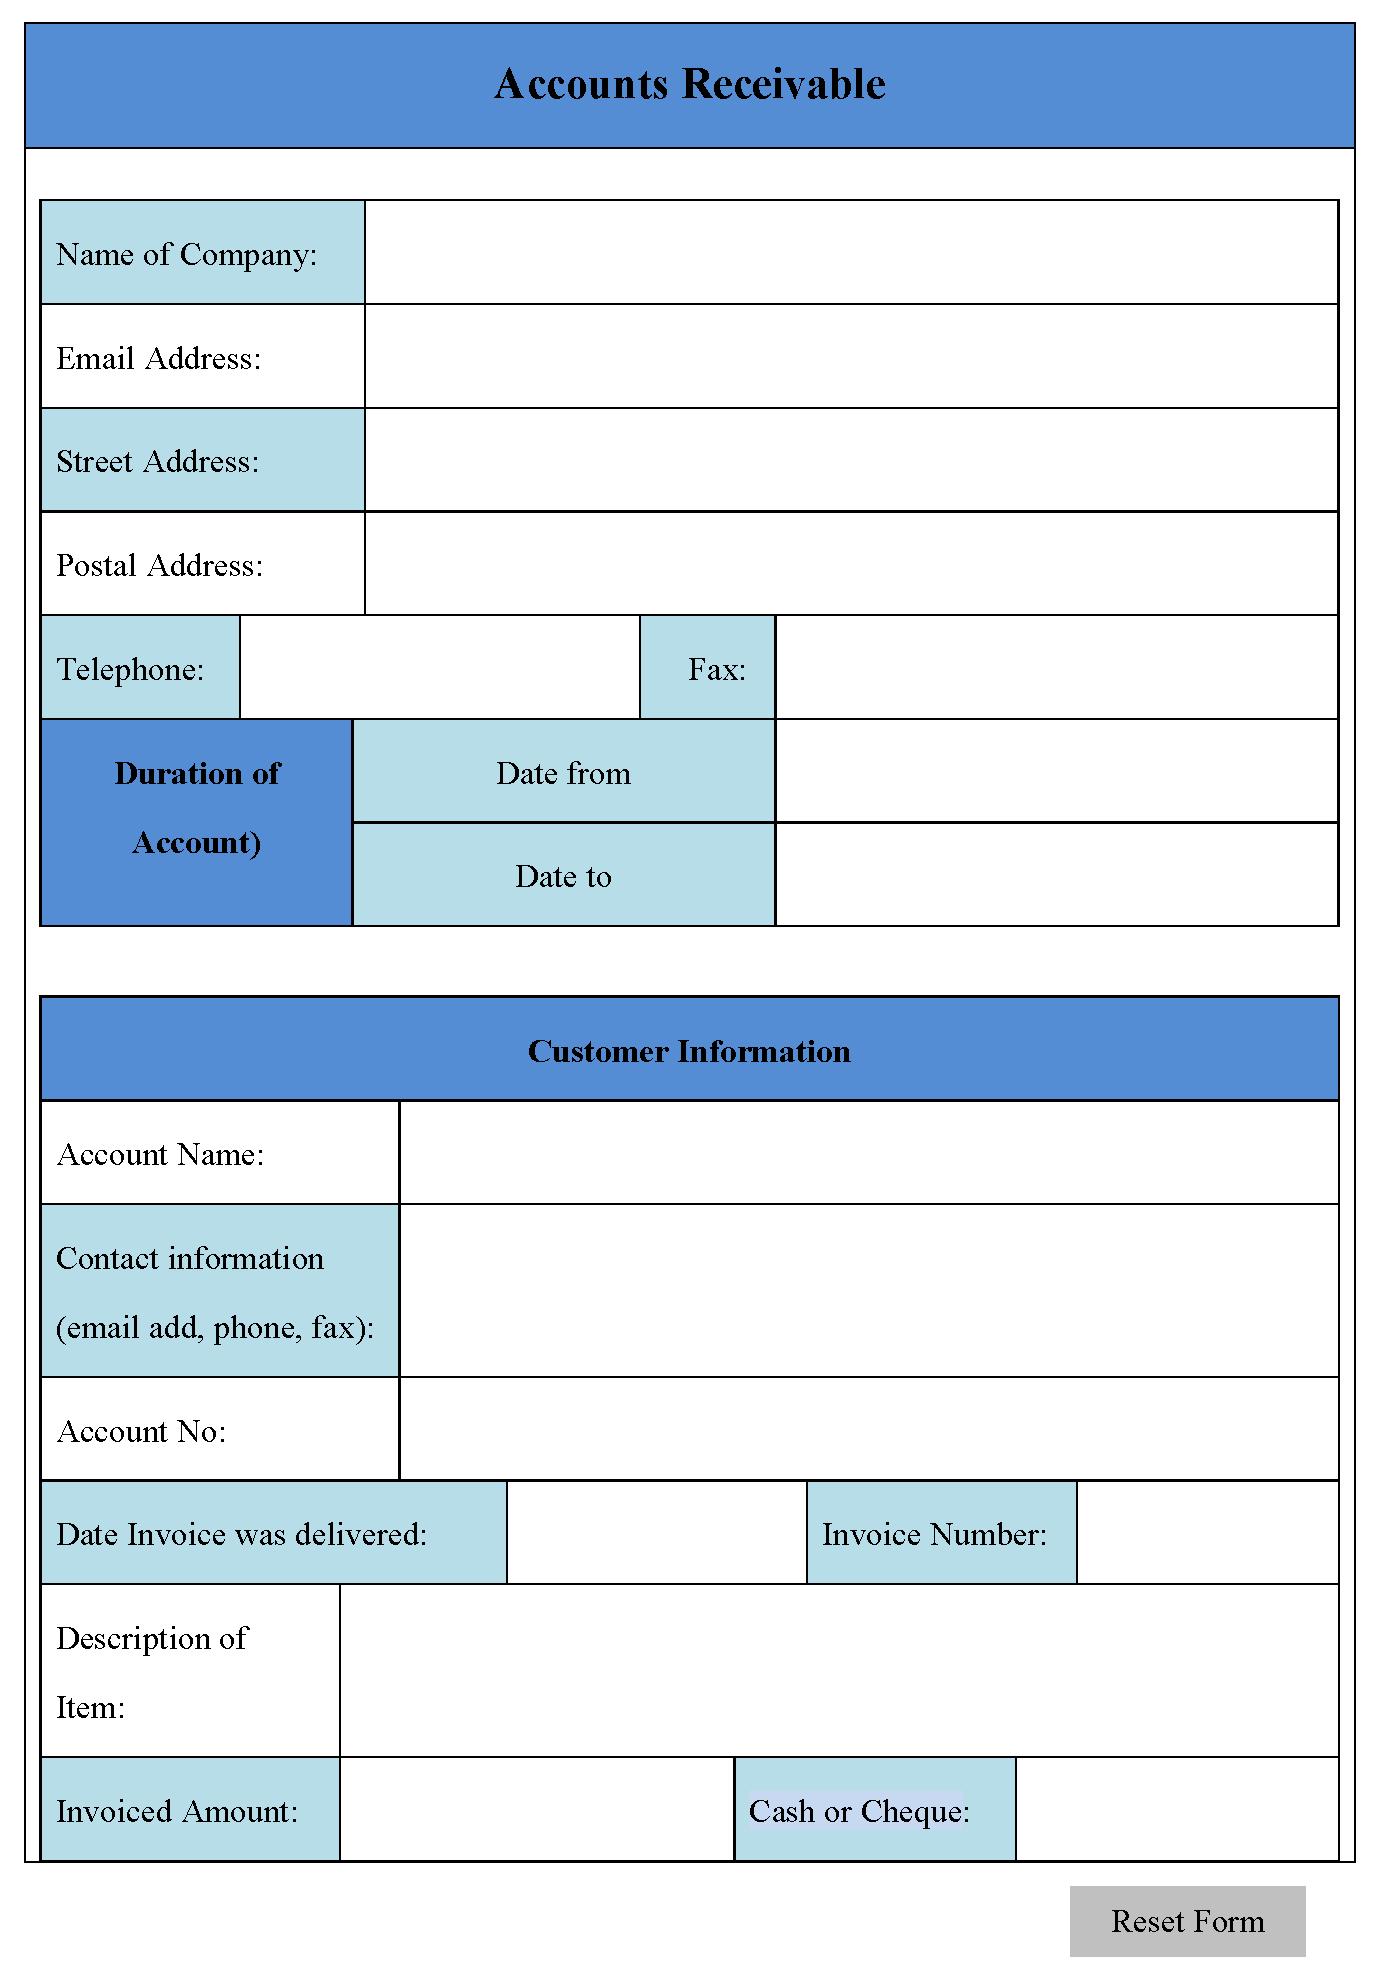 Accounts Receivable Form